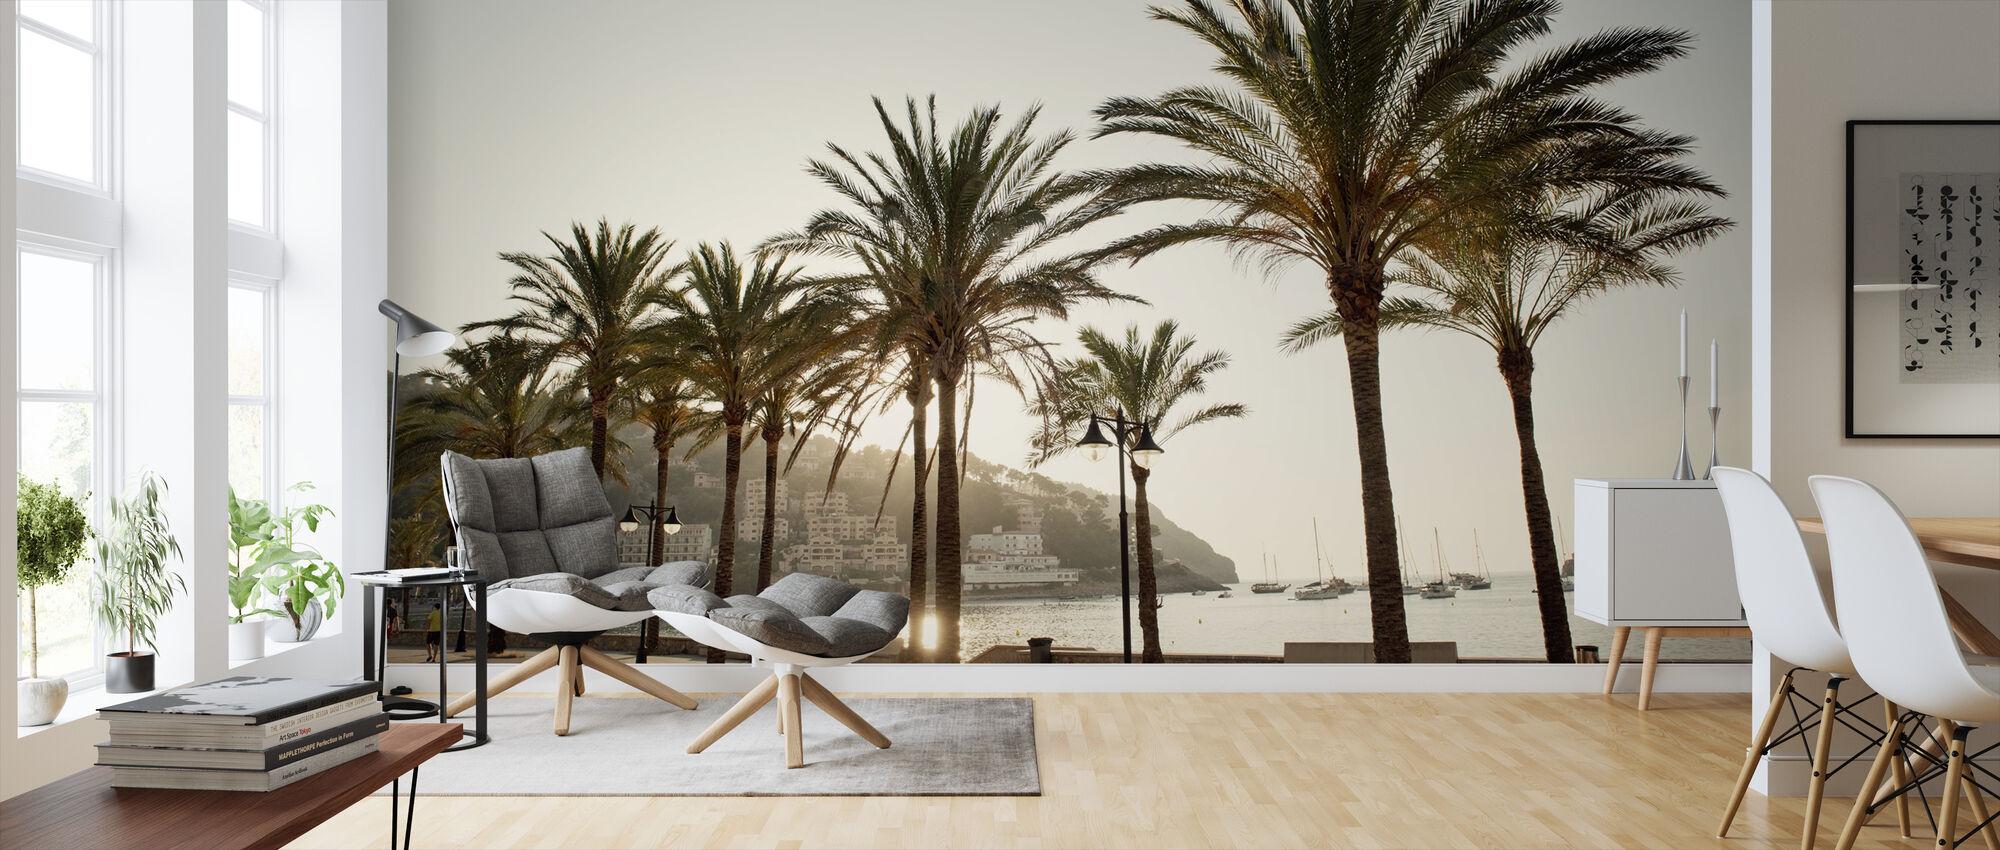 Mallorca Boardwalk - Wallpaper - Living Room